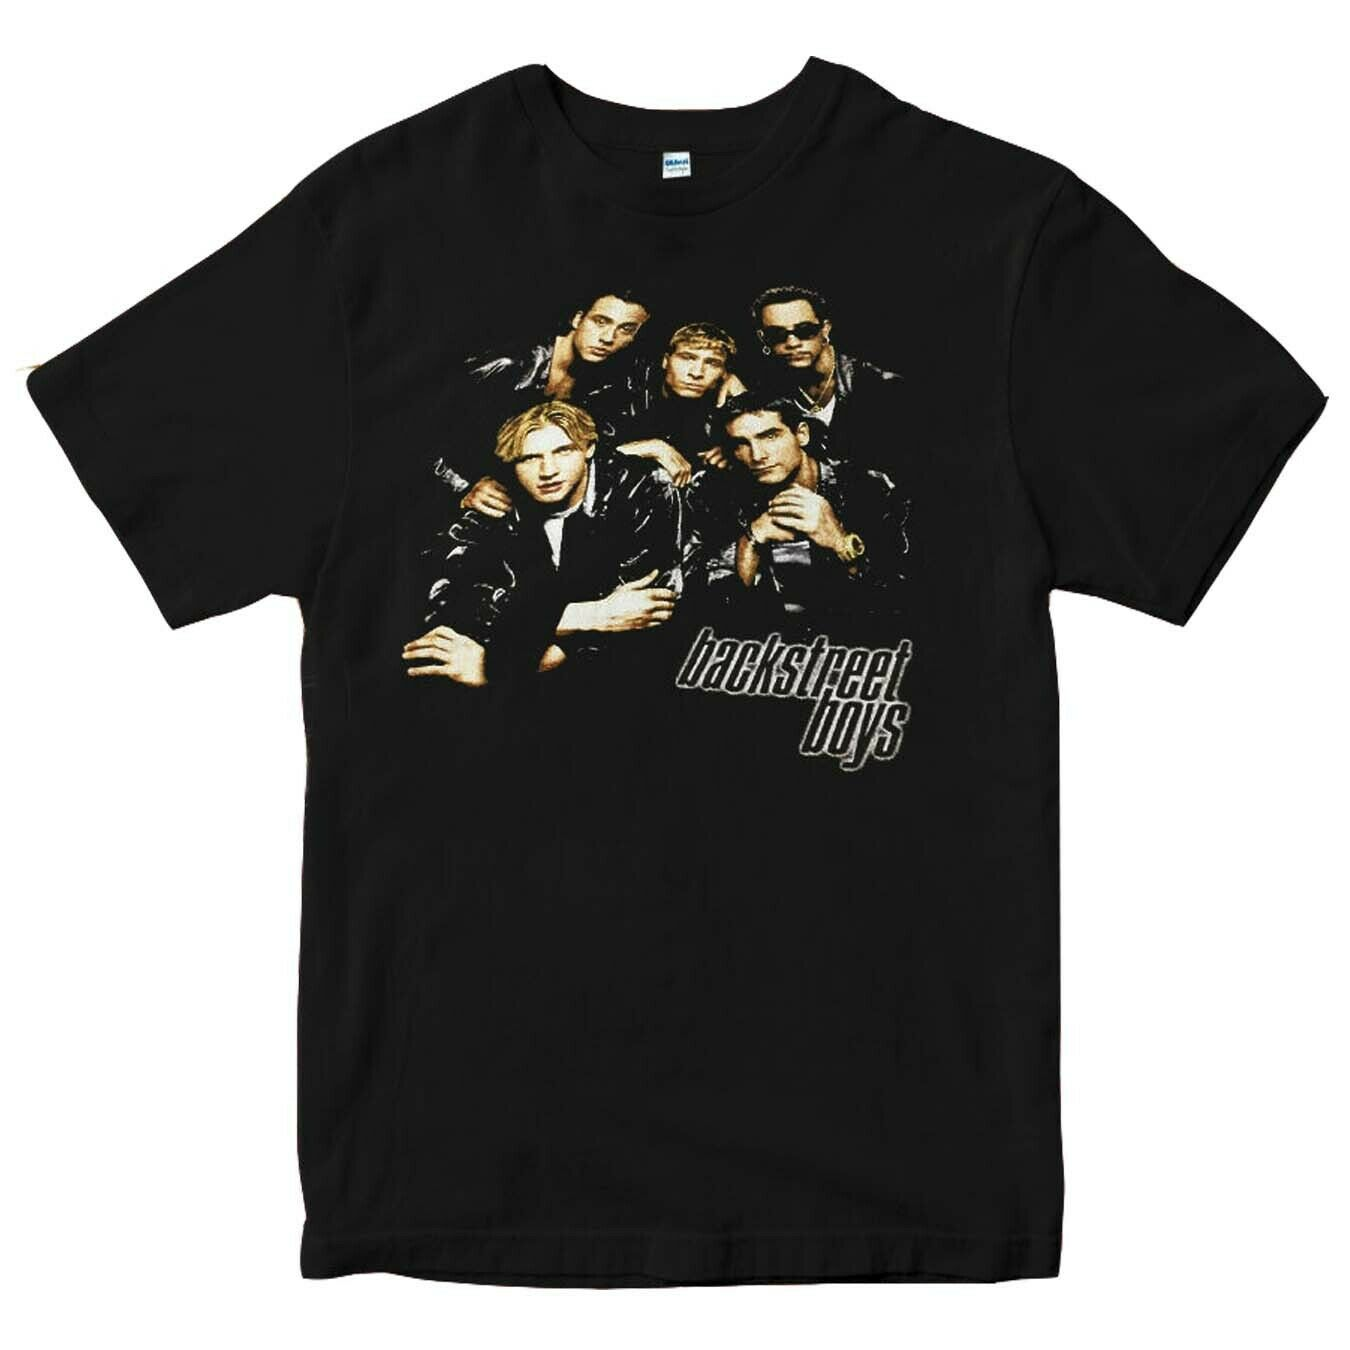 Vintage 90s Backstreet Boys 1998 Tour T-Shirt TOP Reeprint Top Quality Cotton Casual Men T Shirts Men Free Shipping Plus Size